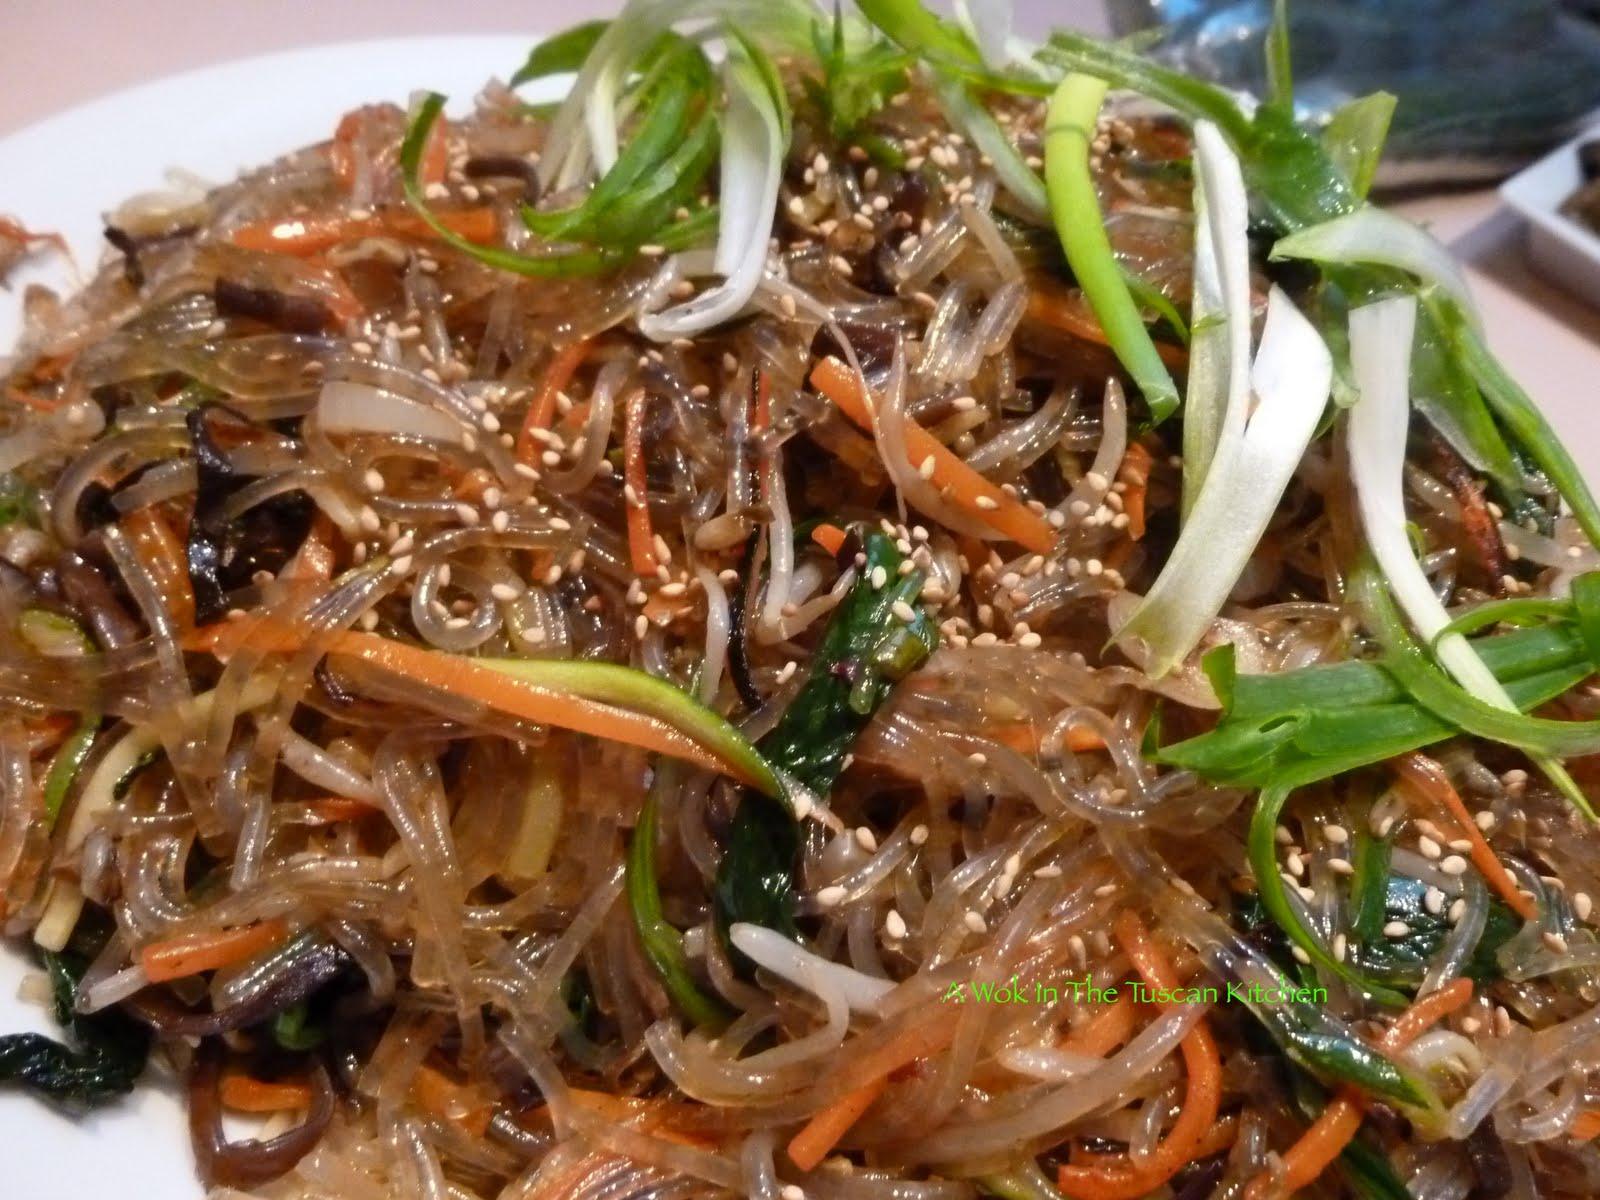 A Wok in the Tuscan Kitchen: Japchae, Korean Glass Noodles